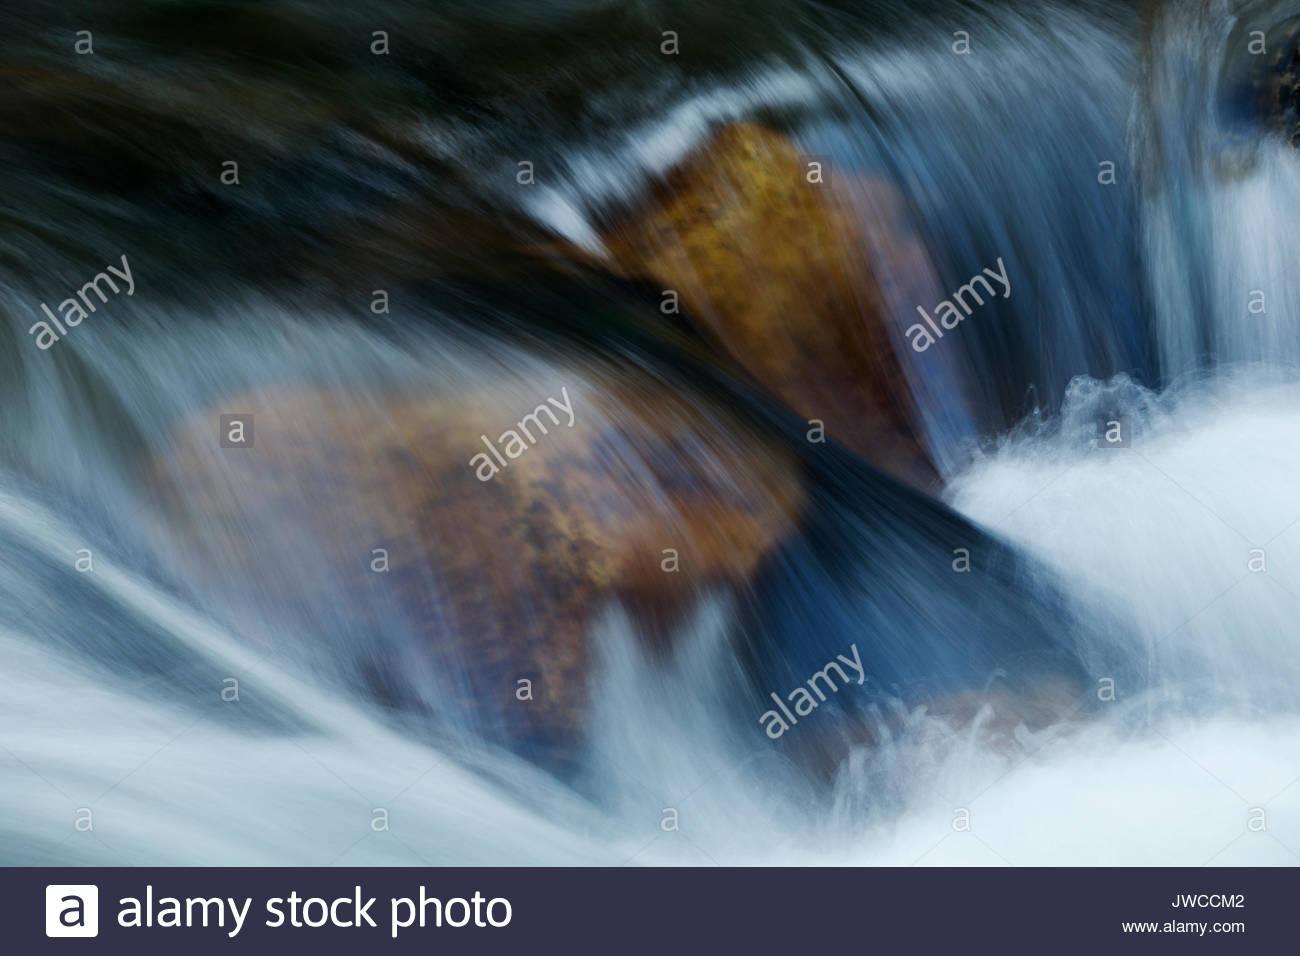 Close up of swiftly flowing water in Tenaya Creek. - Stock Image